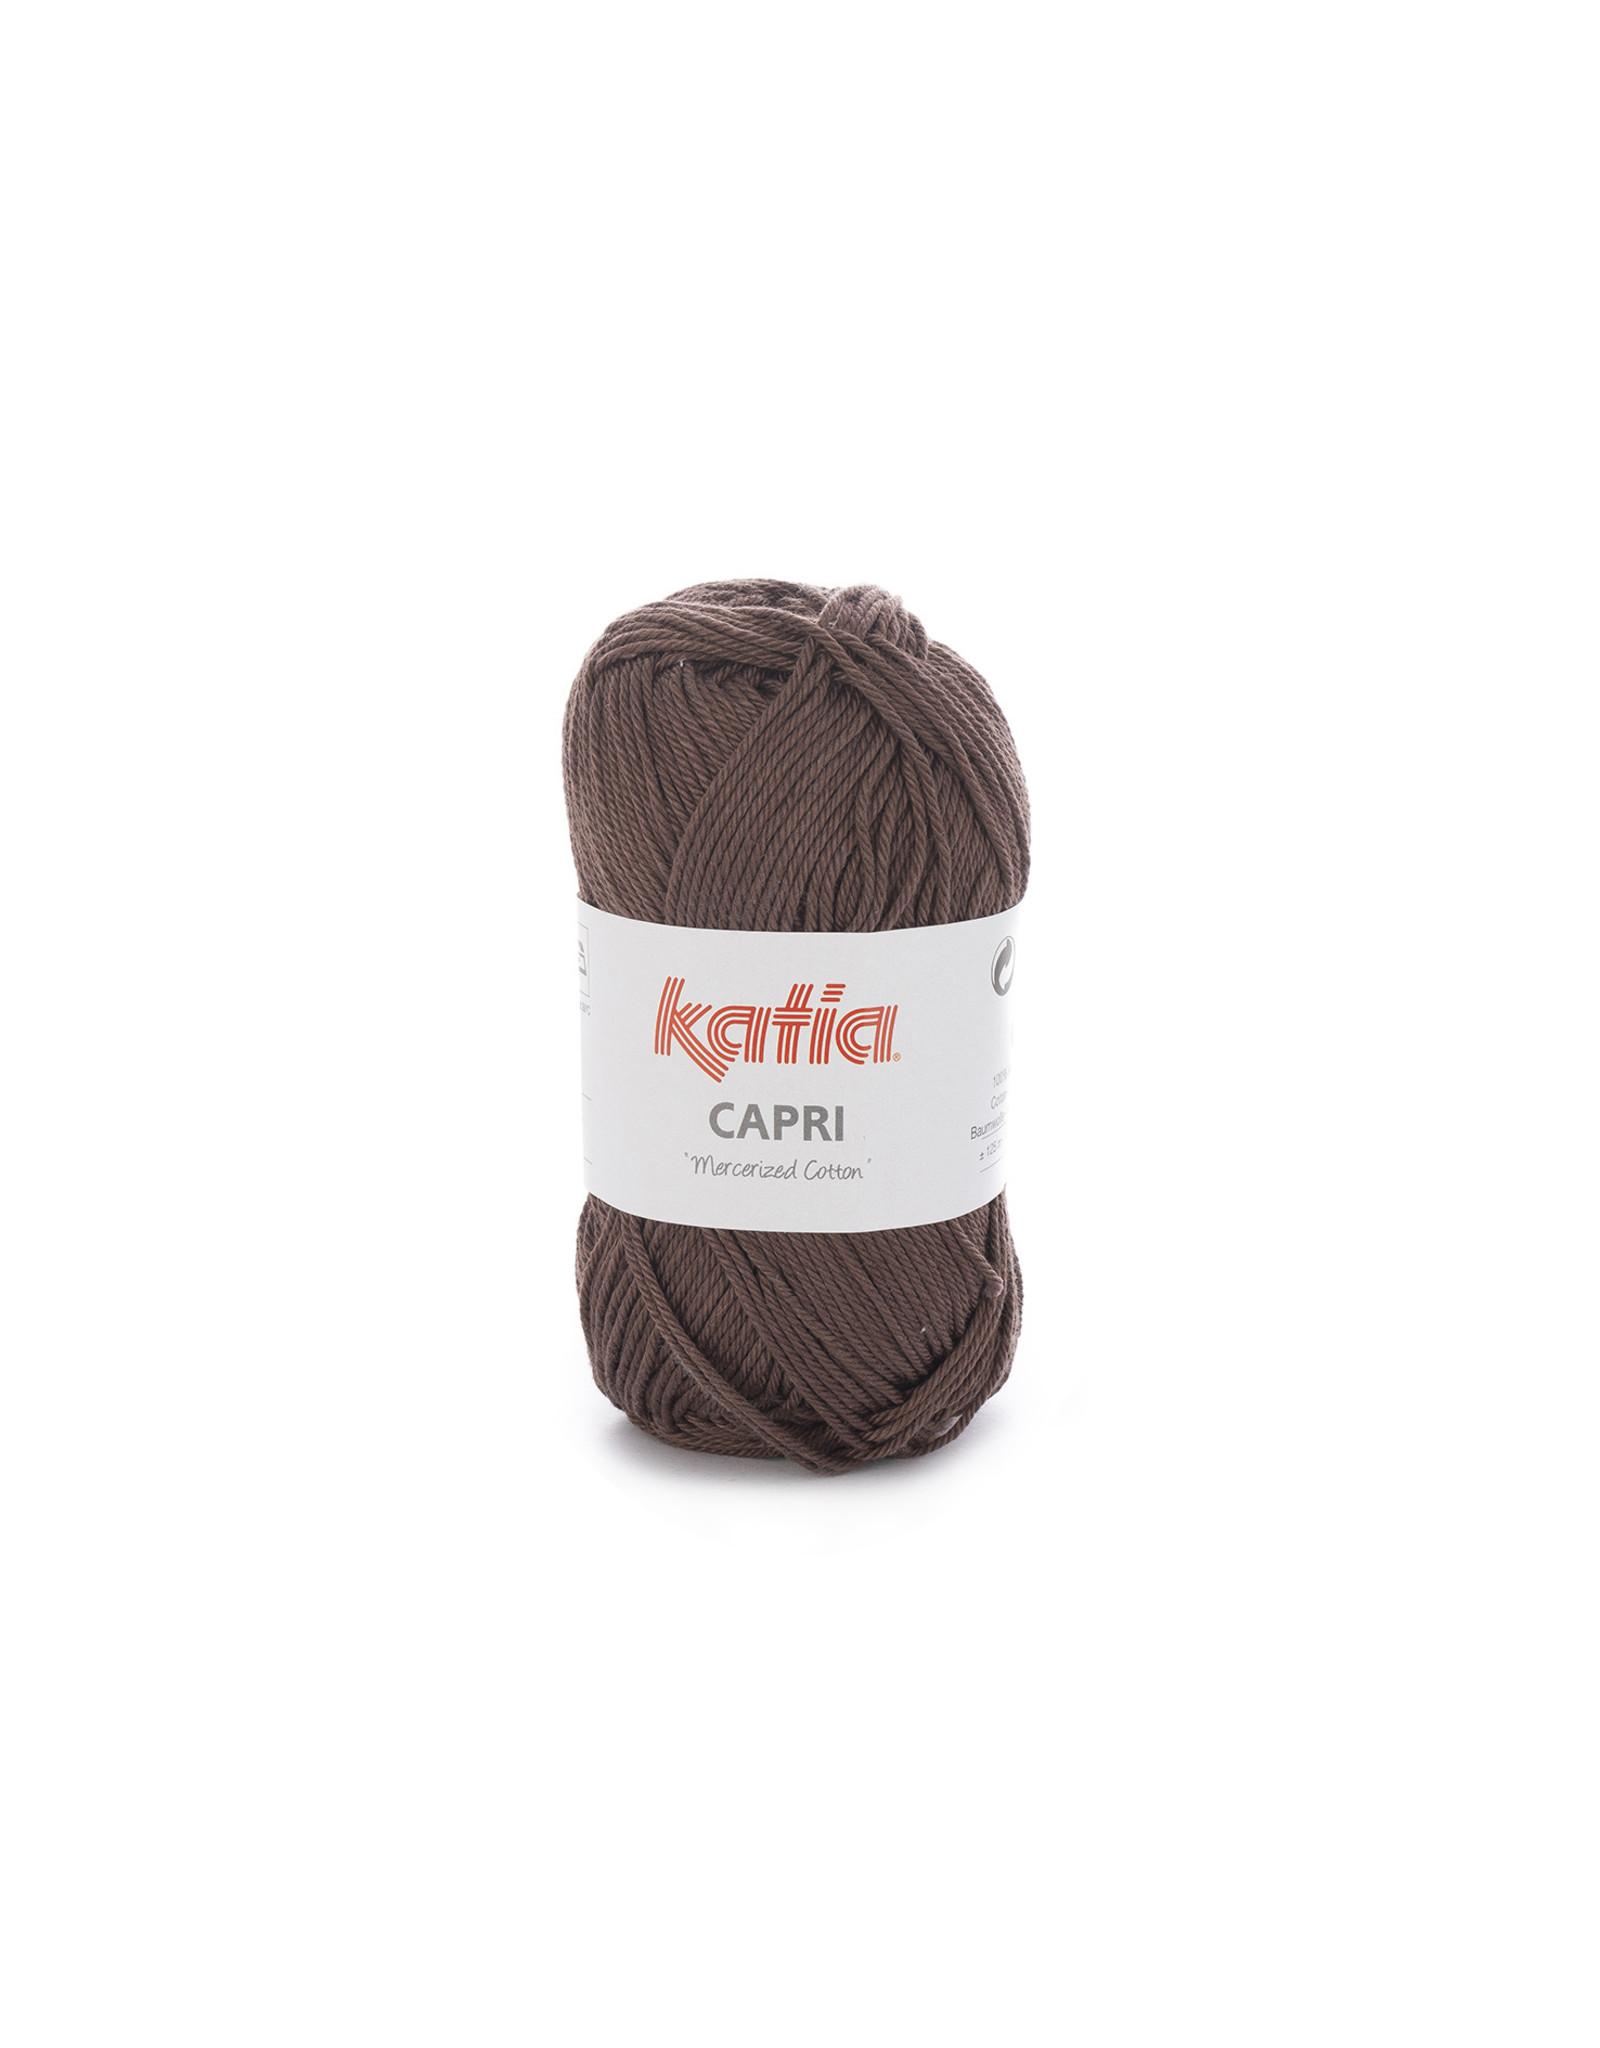 Katia Katia Capri - kleur 127 Donker bruin - bundel 5 x 50 gr. / 125 m. - 100% katoen